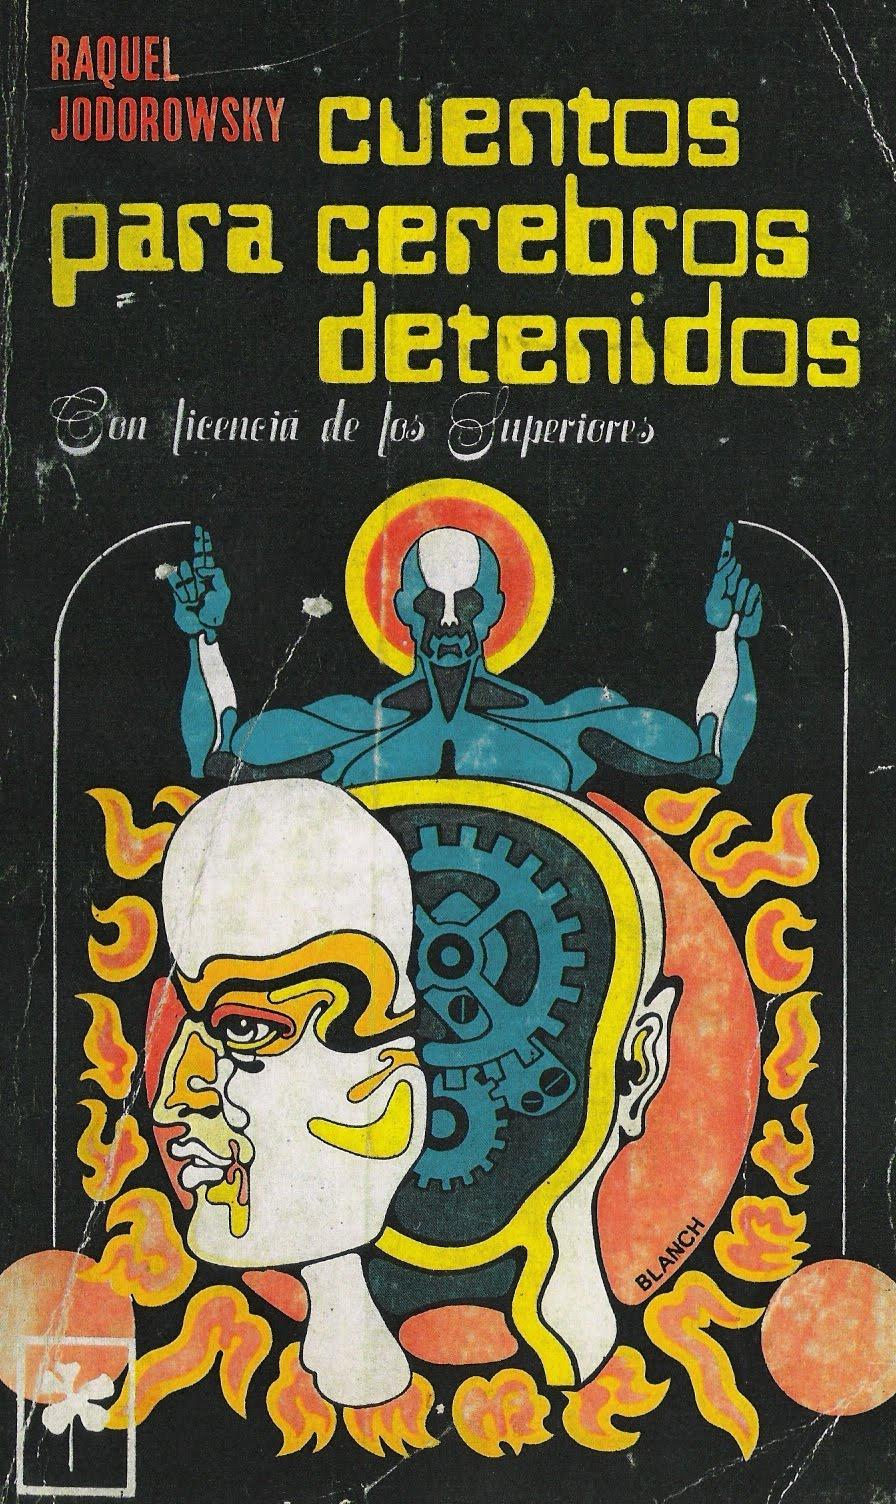 http://4.bp.blogspot.com/-nlZjZAE4rP8/UWLeqwtC6fI/AAAAAAAAEyE/fjtSdkwKDbA/s1600/Cuentos+para+cerebros+detenidos+raquel+jodorowsky.JPG